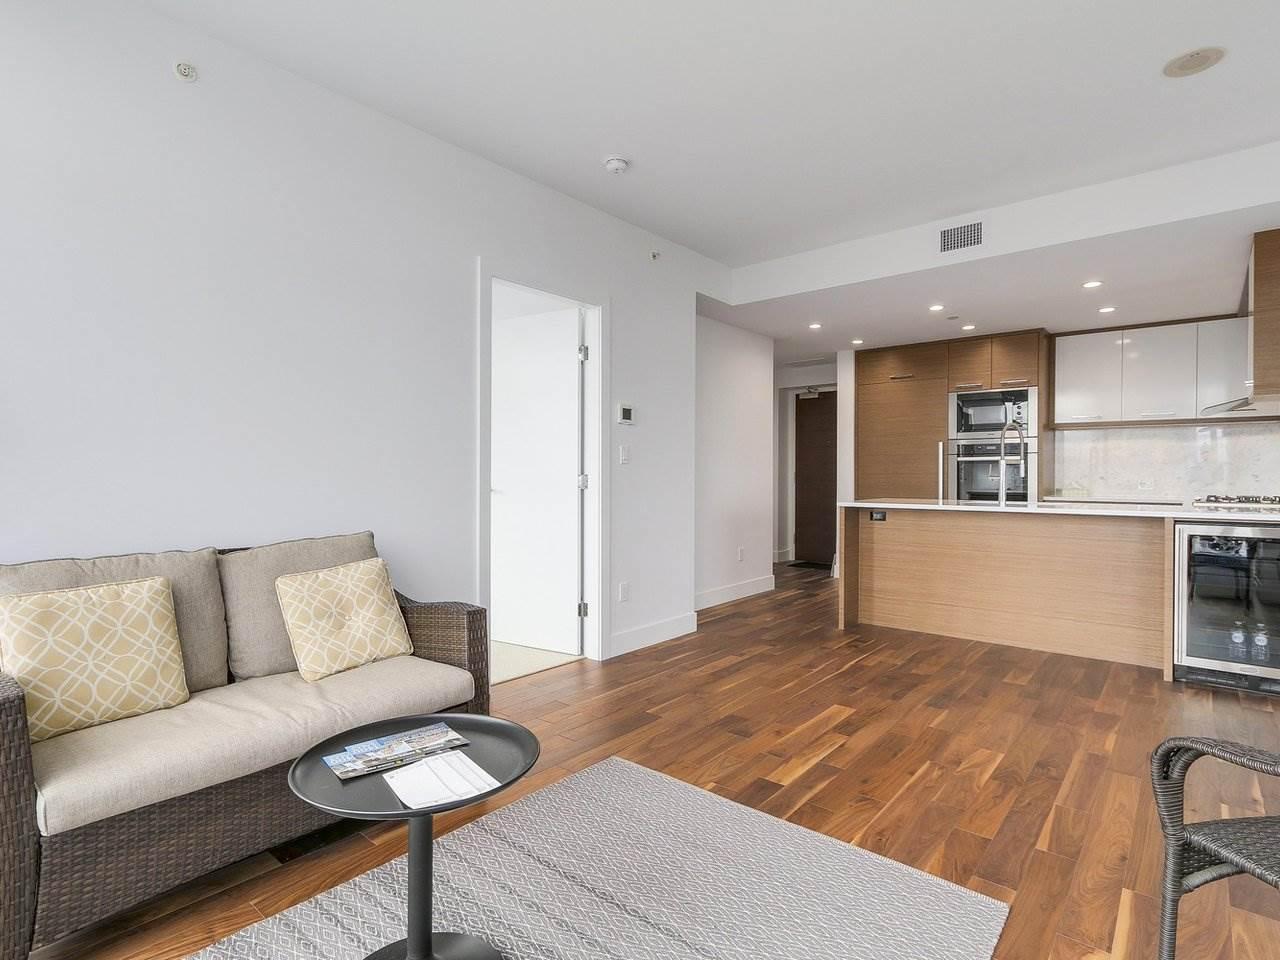 Condo Apartment at 1202 4360 BERESFORD STREET, Unit 1202, Burnaby South, British Columbia. Image 10